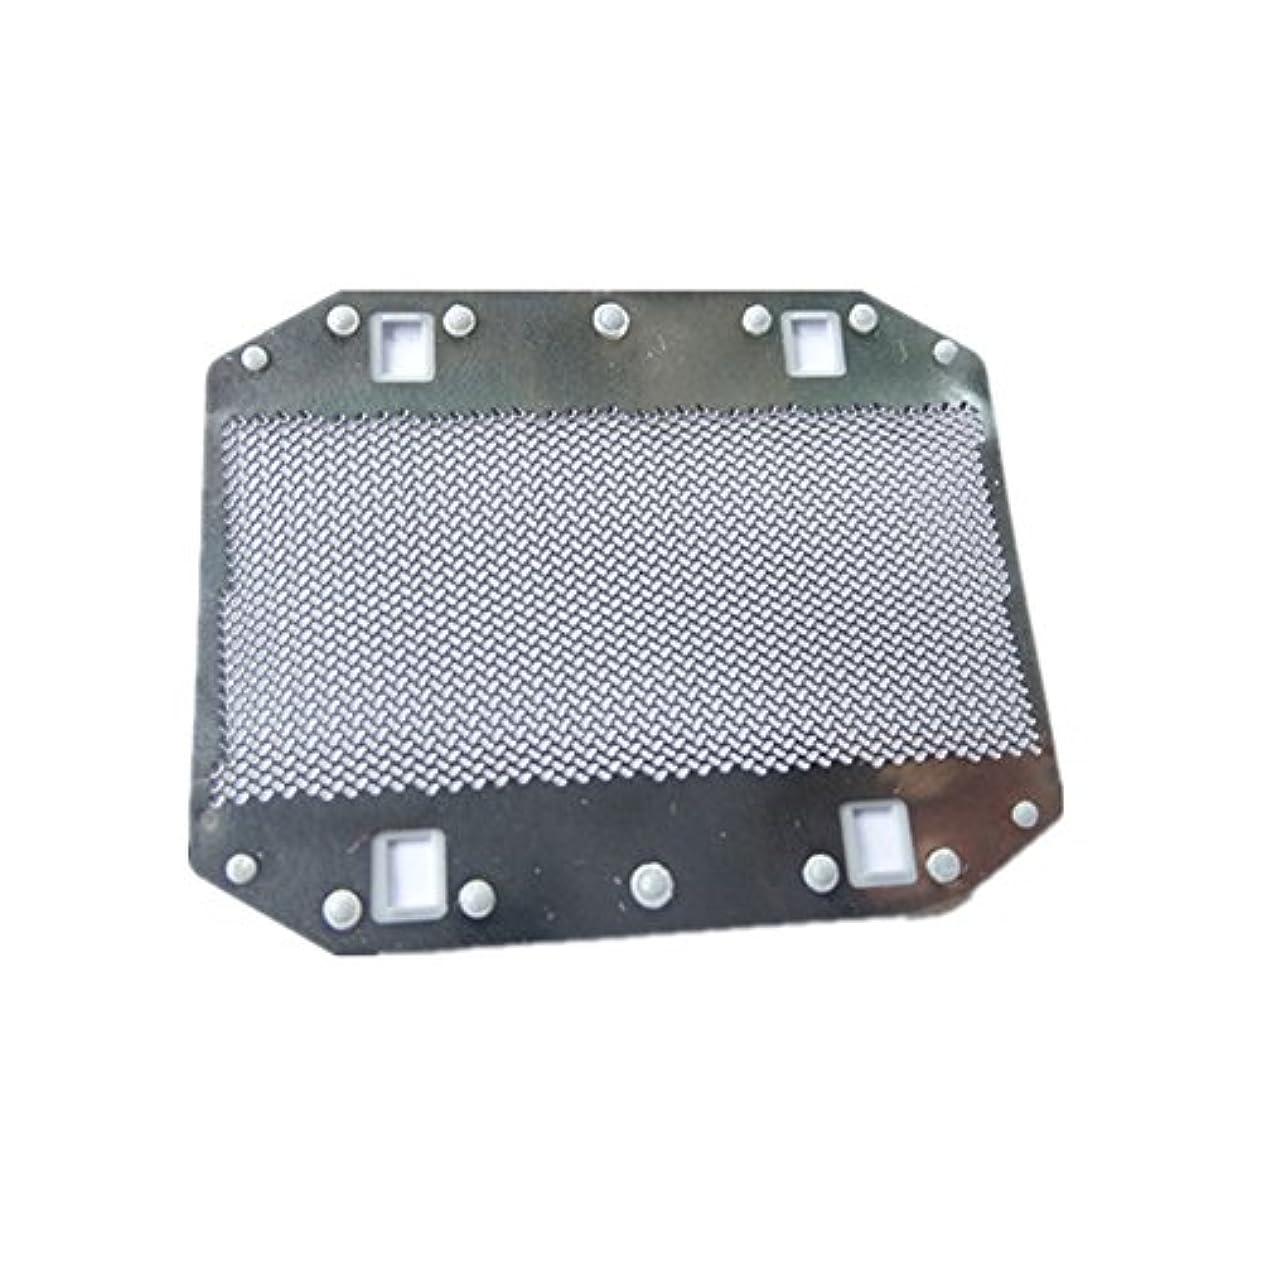 HZjundasi シェーバー剃刀 Outer ホイル for Panasonic ES3050/376/317/RC40/RP20 ES9943C